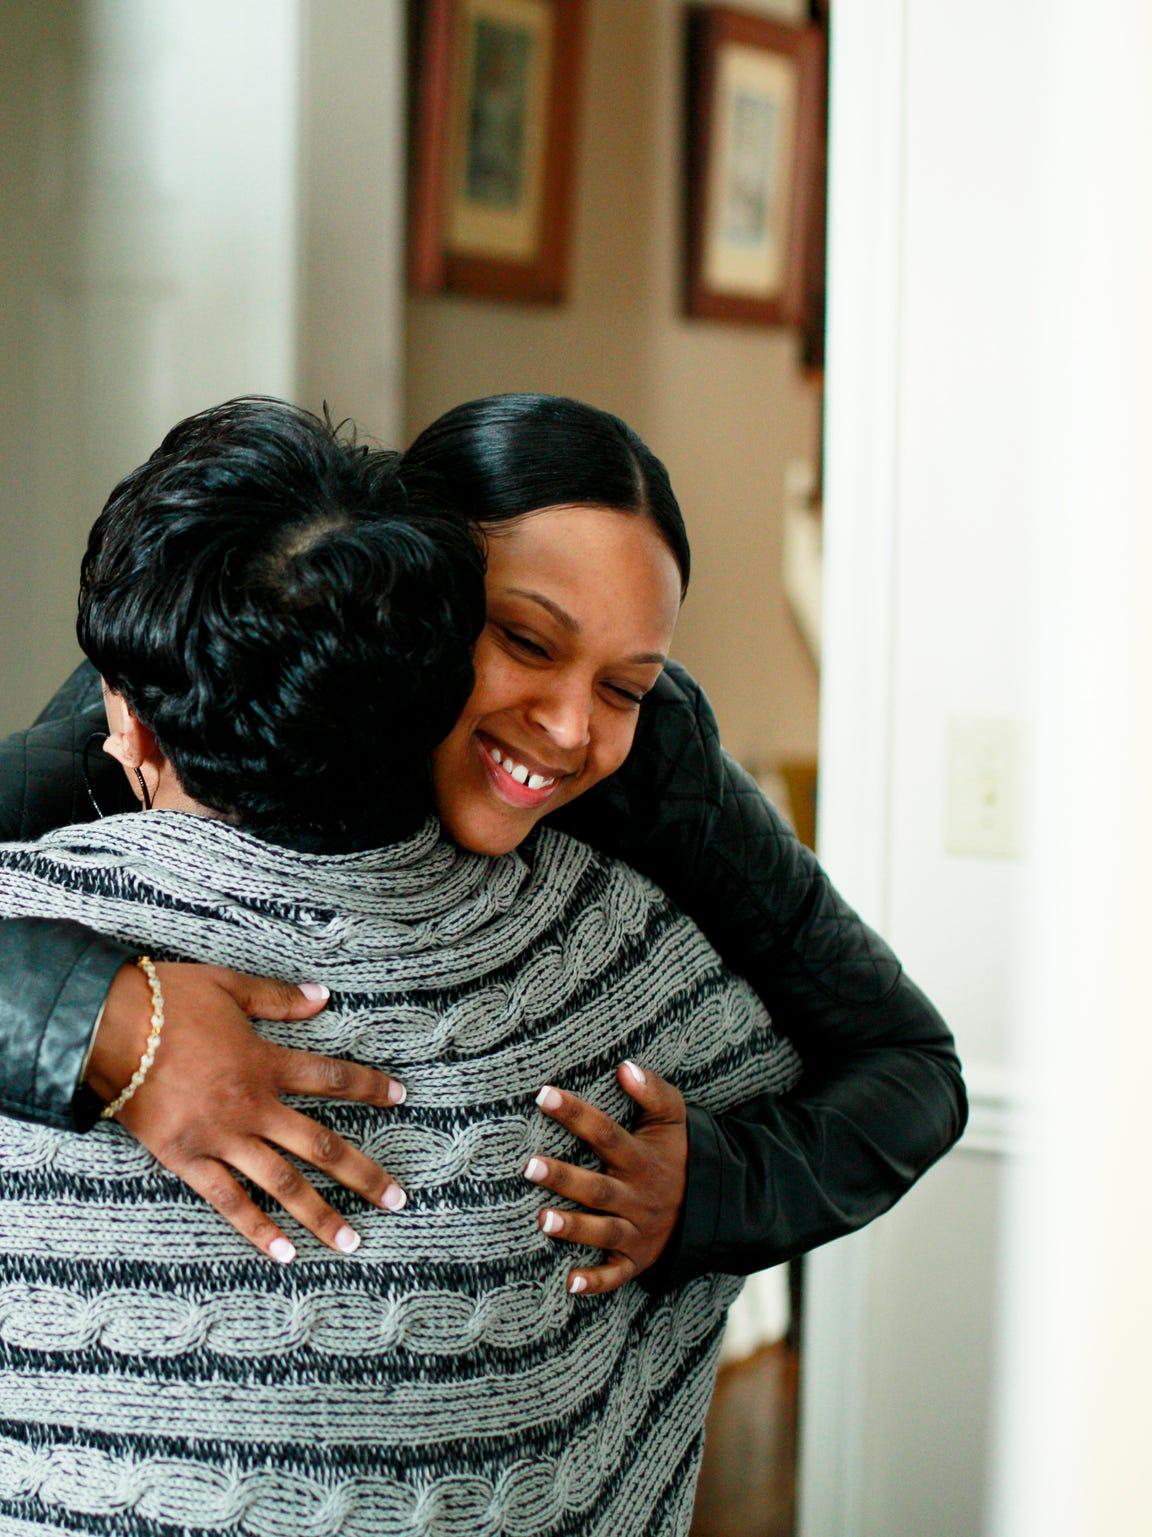 Sudana Wilmott hugs T-Ann Johnson who is helping her